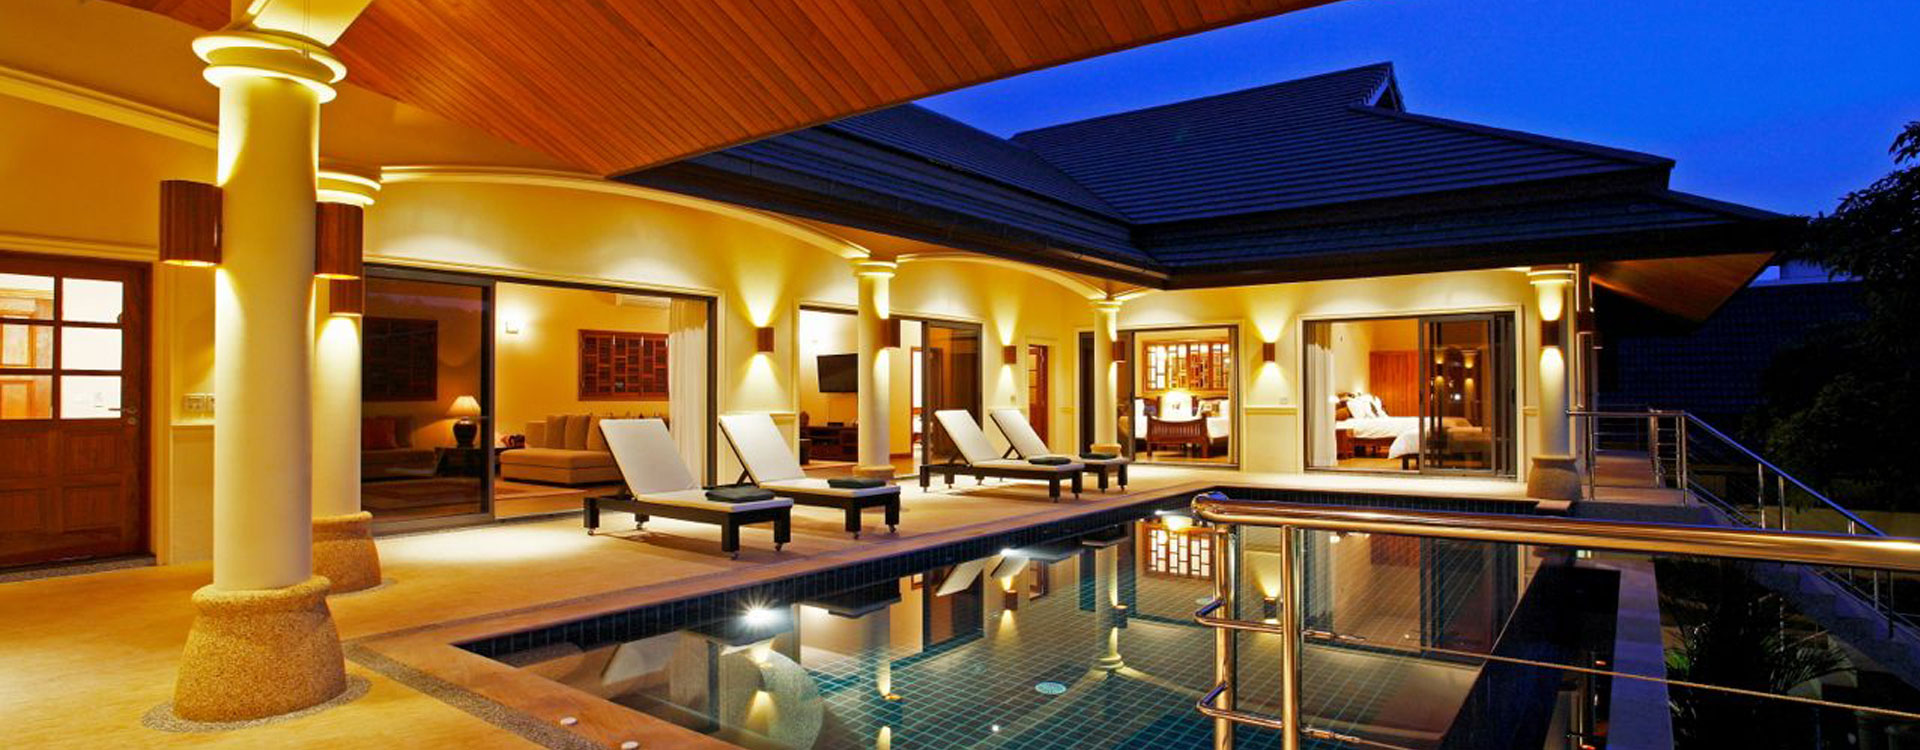 Villa2 Pool at Night